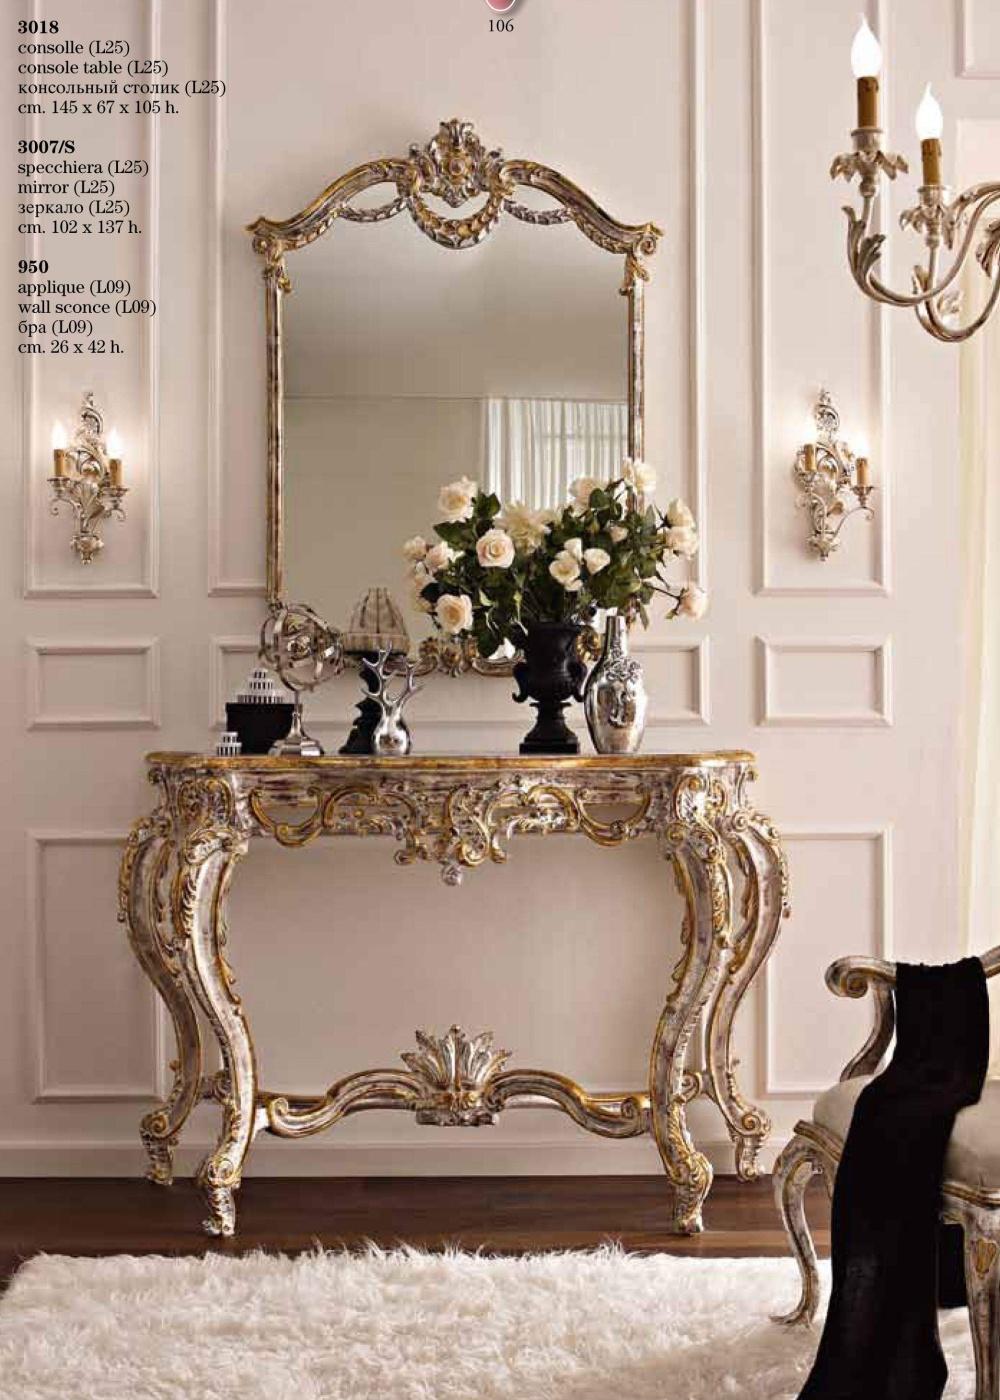 Консоль с зеркалом Andrea Fanfani - Giorno